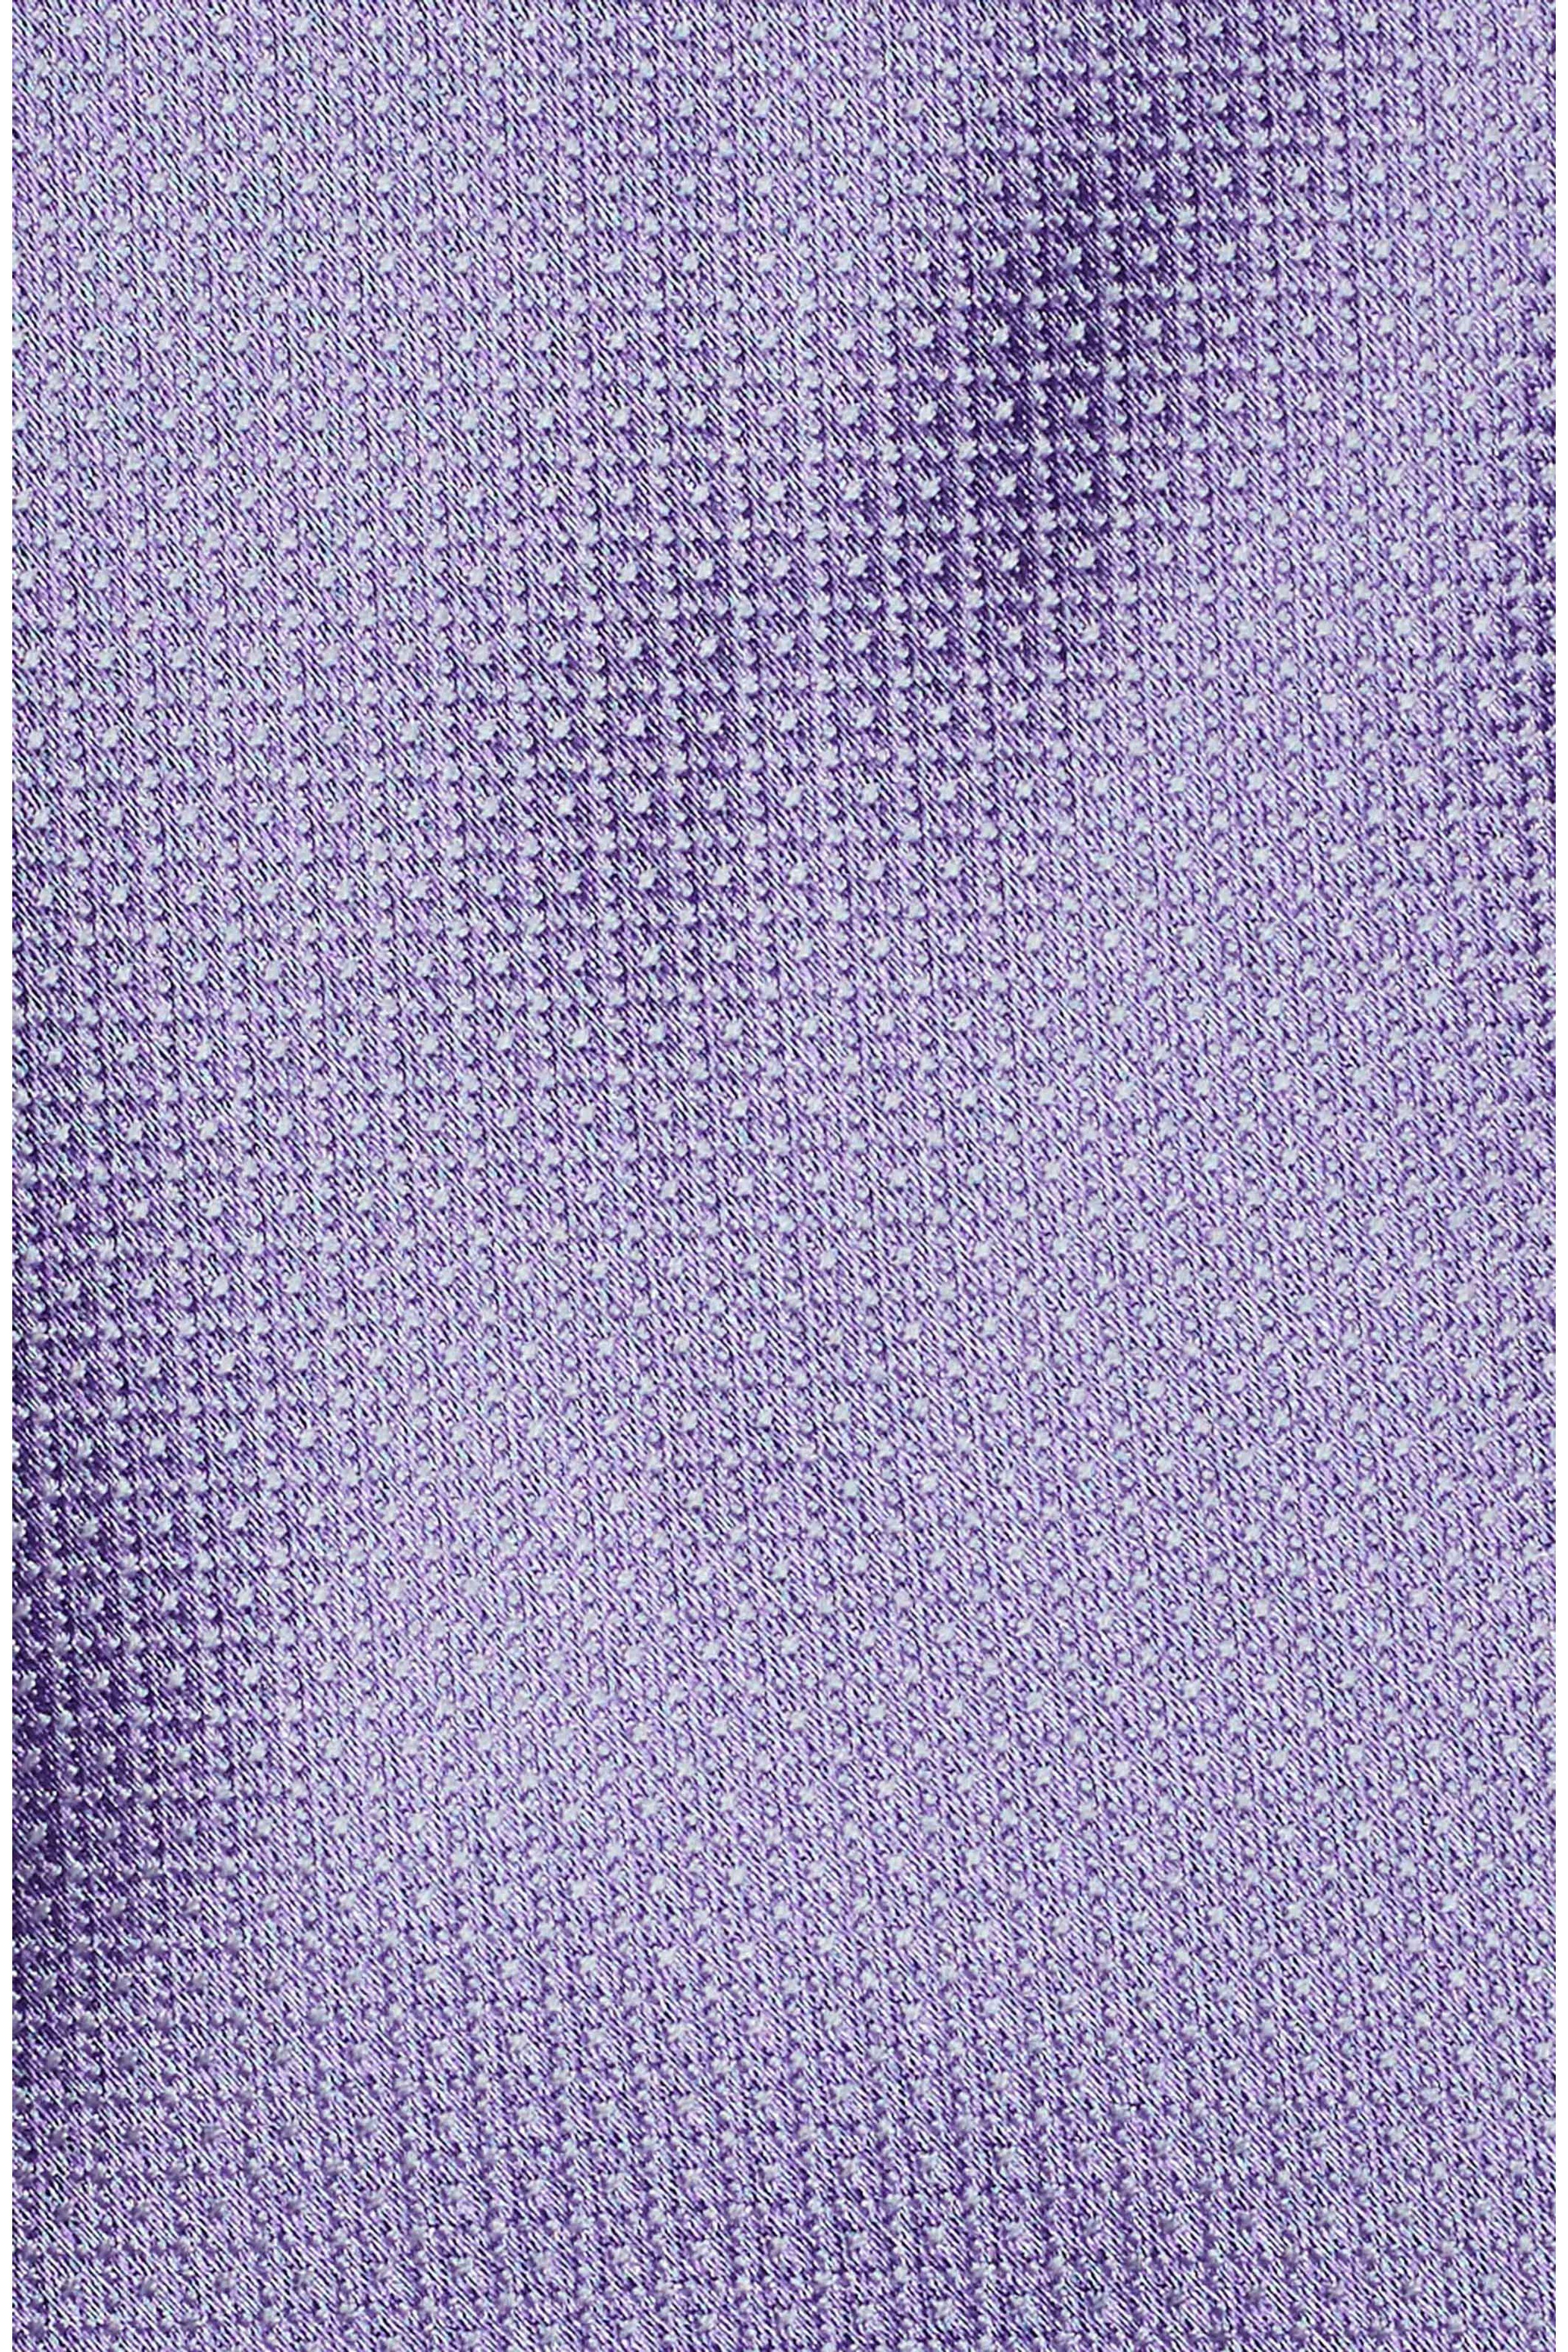 0836NFG40101_860_3-GRAVATA-REGULAR-MICROFIBRA